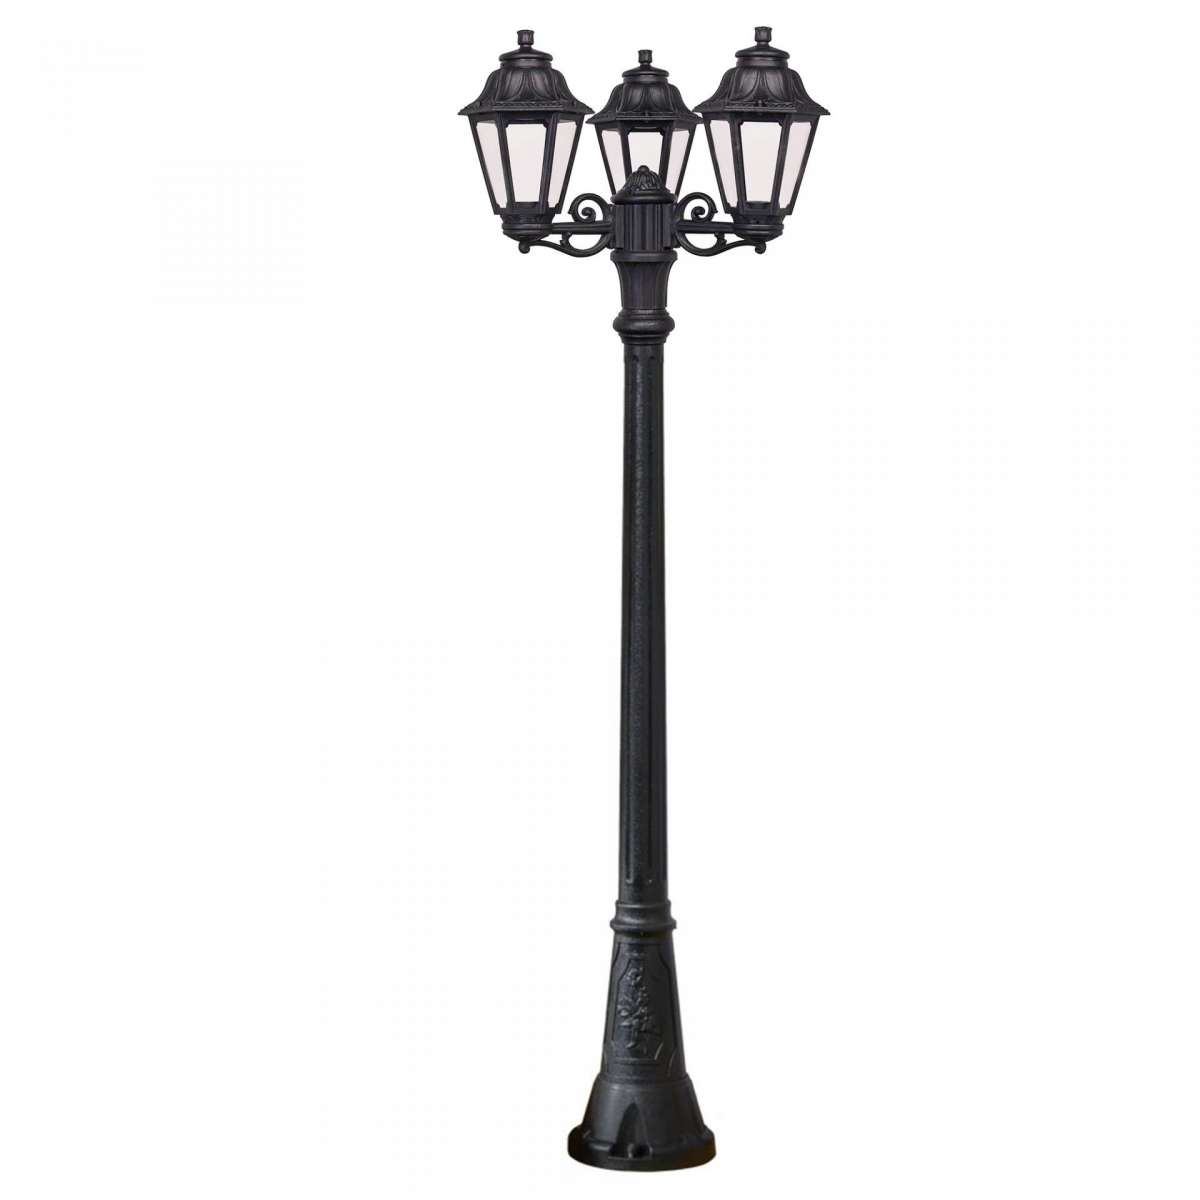 GIGI BISSO ANNA 3 Light Large Post